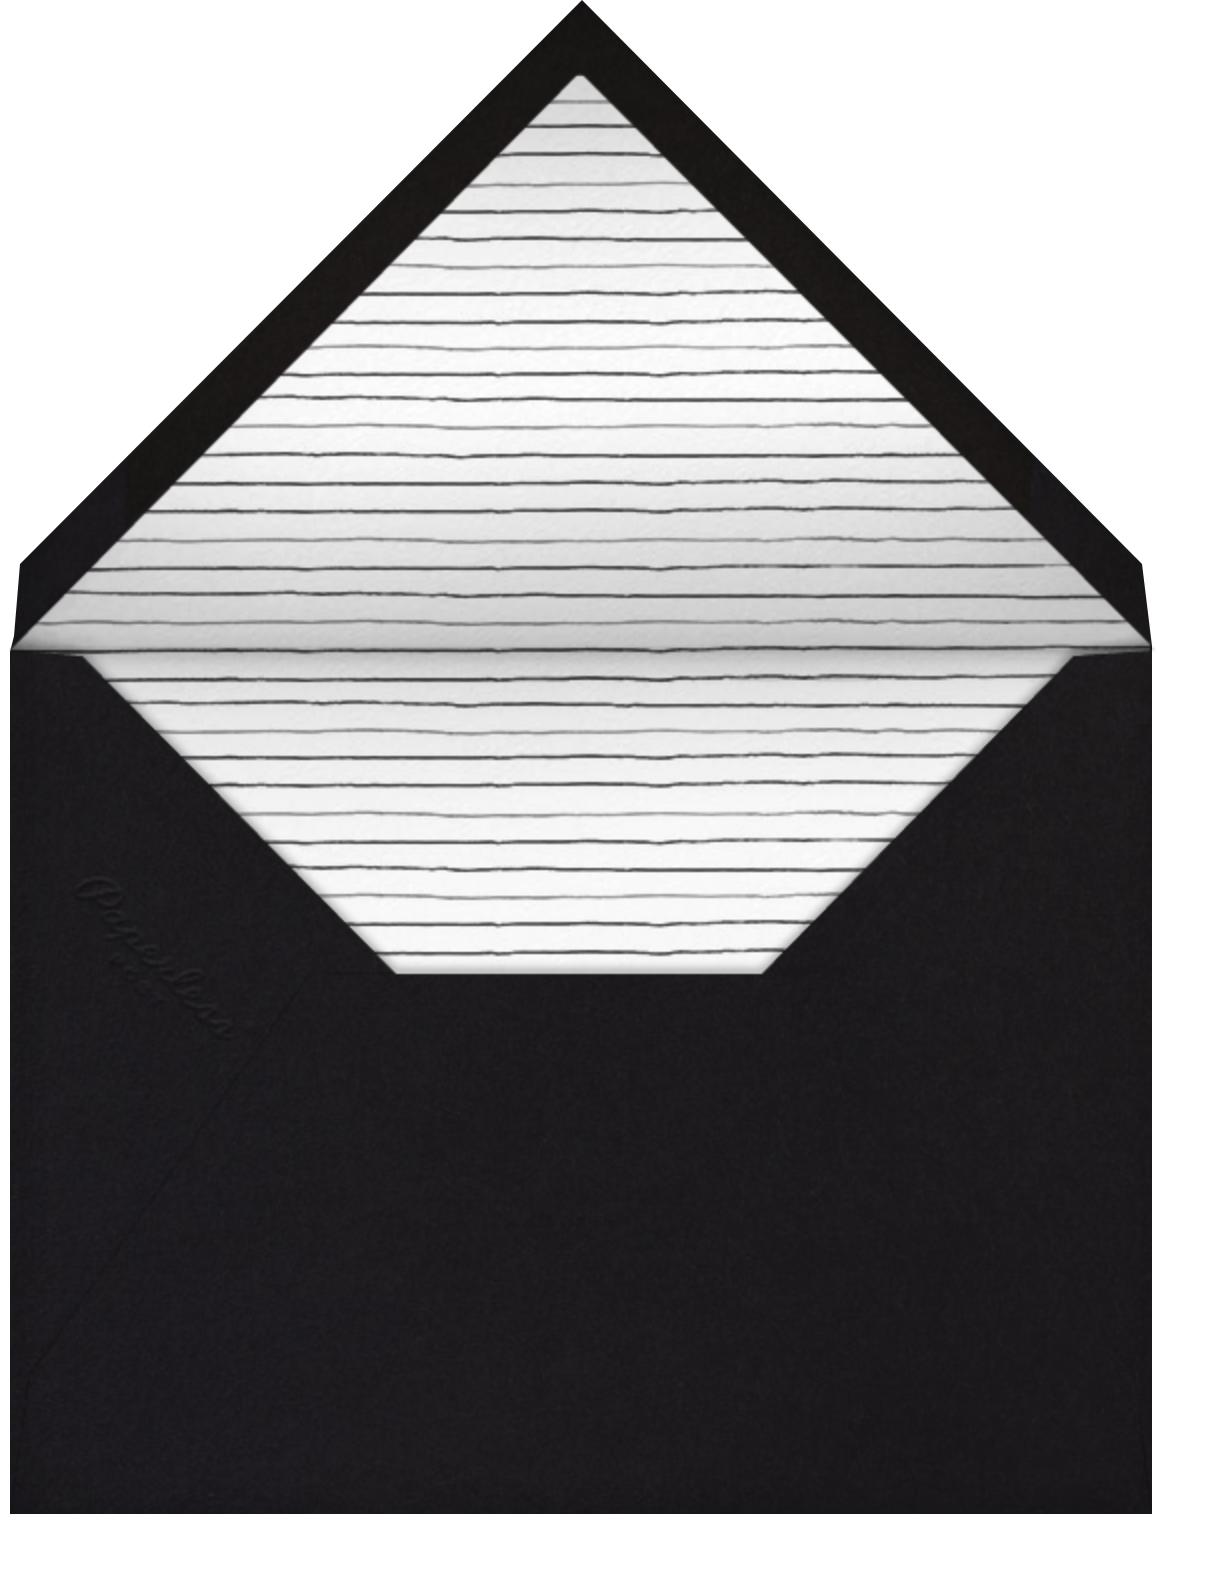 Medium Format Film - Square - Paperless Post - Adult birthday - envelope back